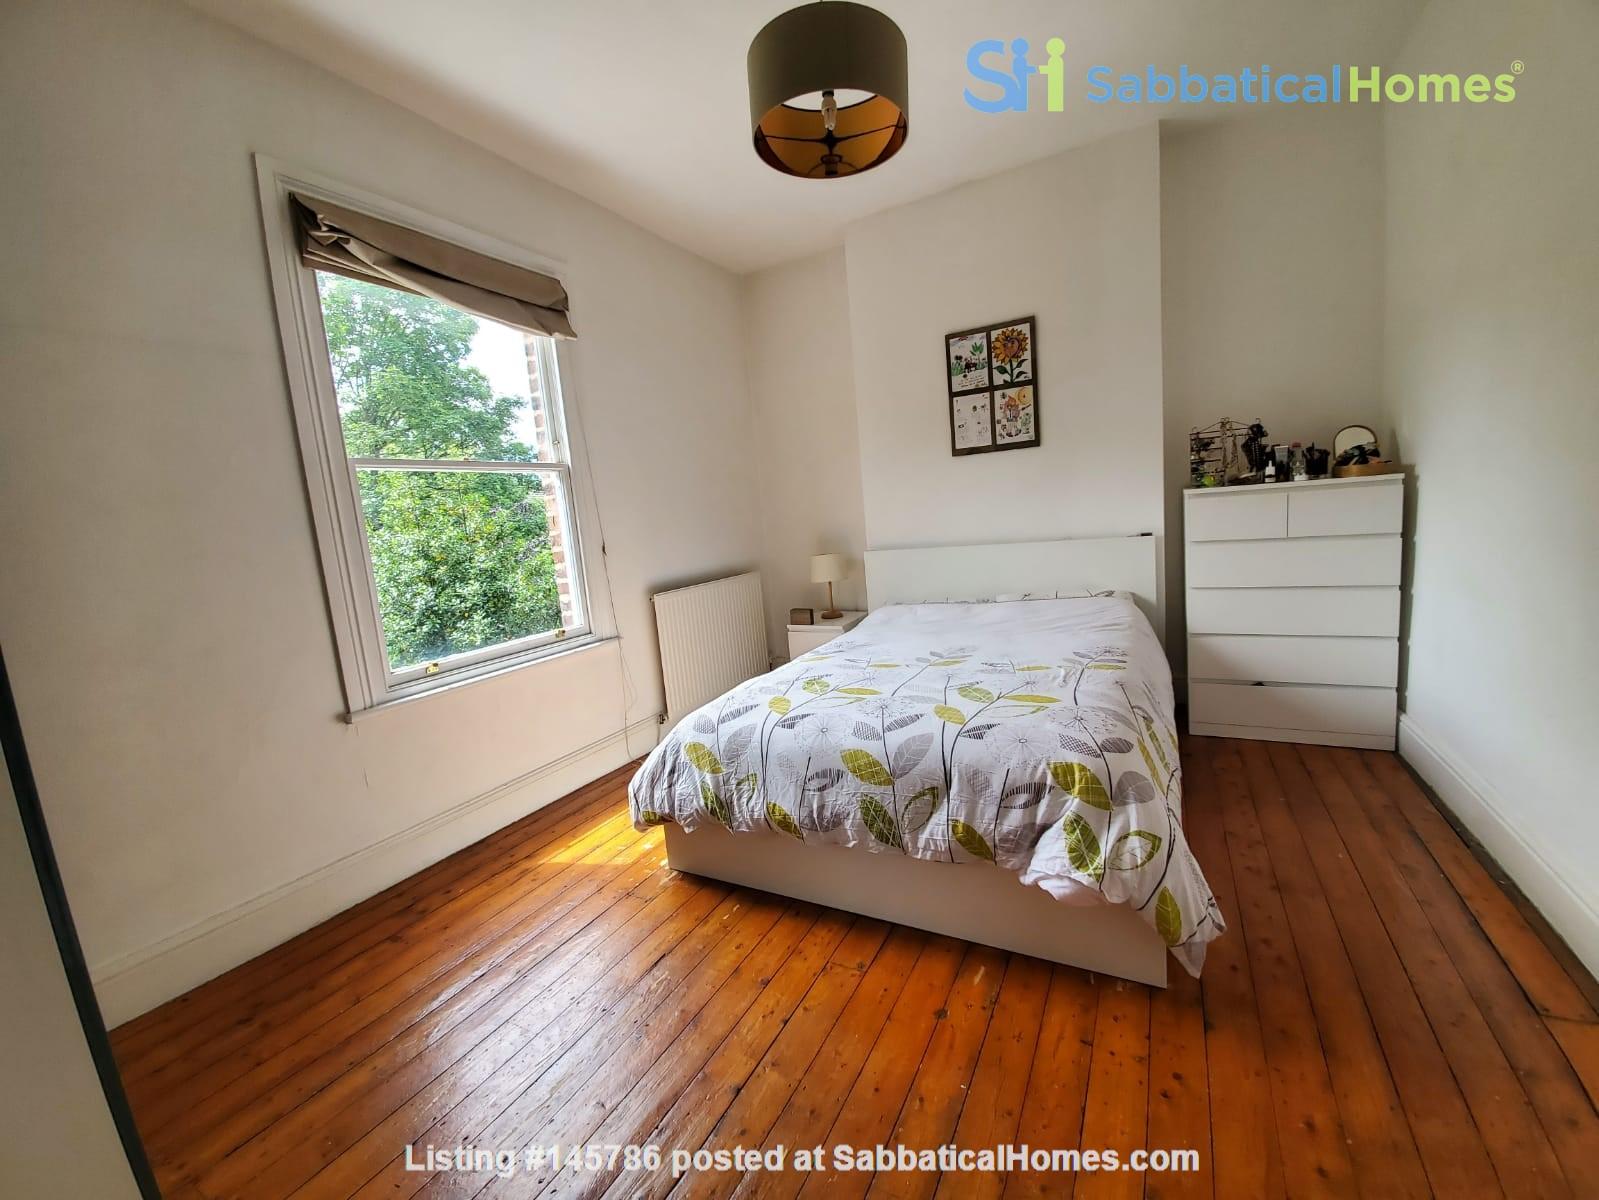 Manchester UK: Spacious, Quiet, Sunlight Filled Flat in Great Neighbourhood Home Rental in  4